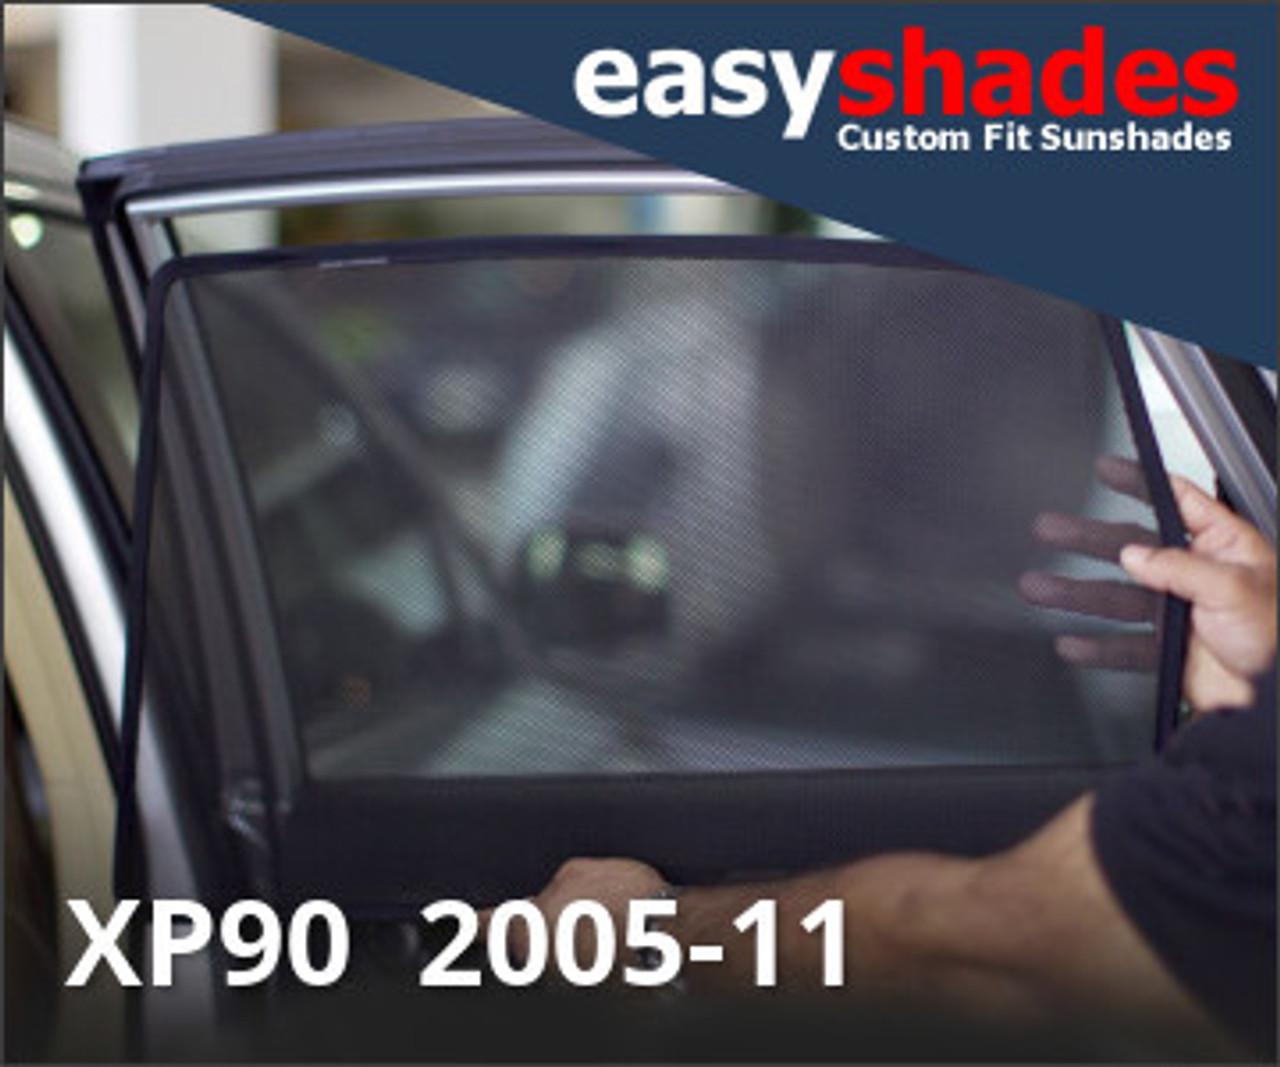 XP90 2005-11